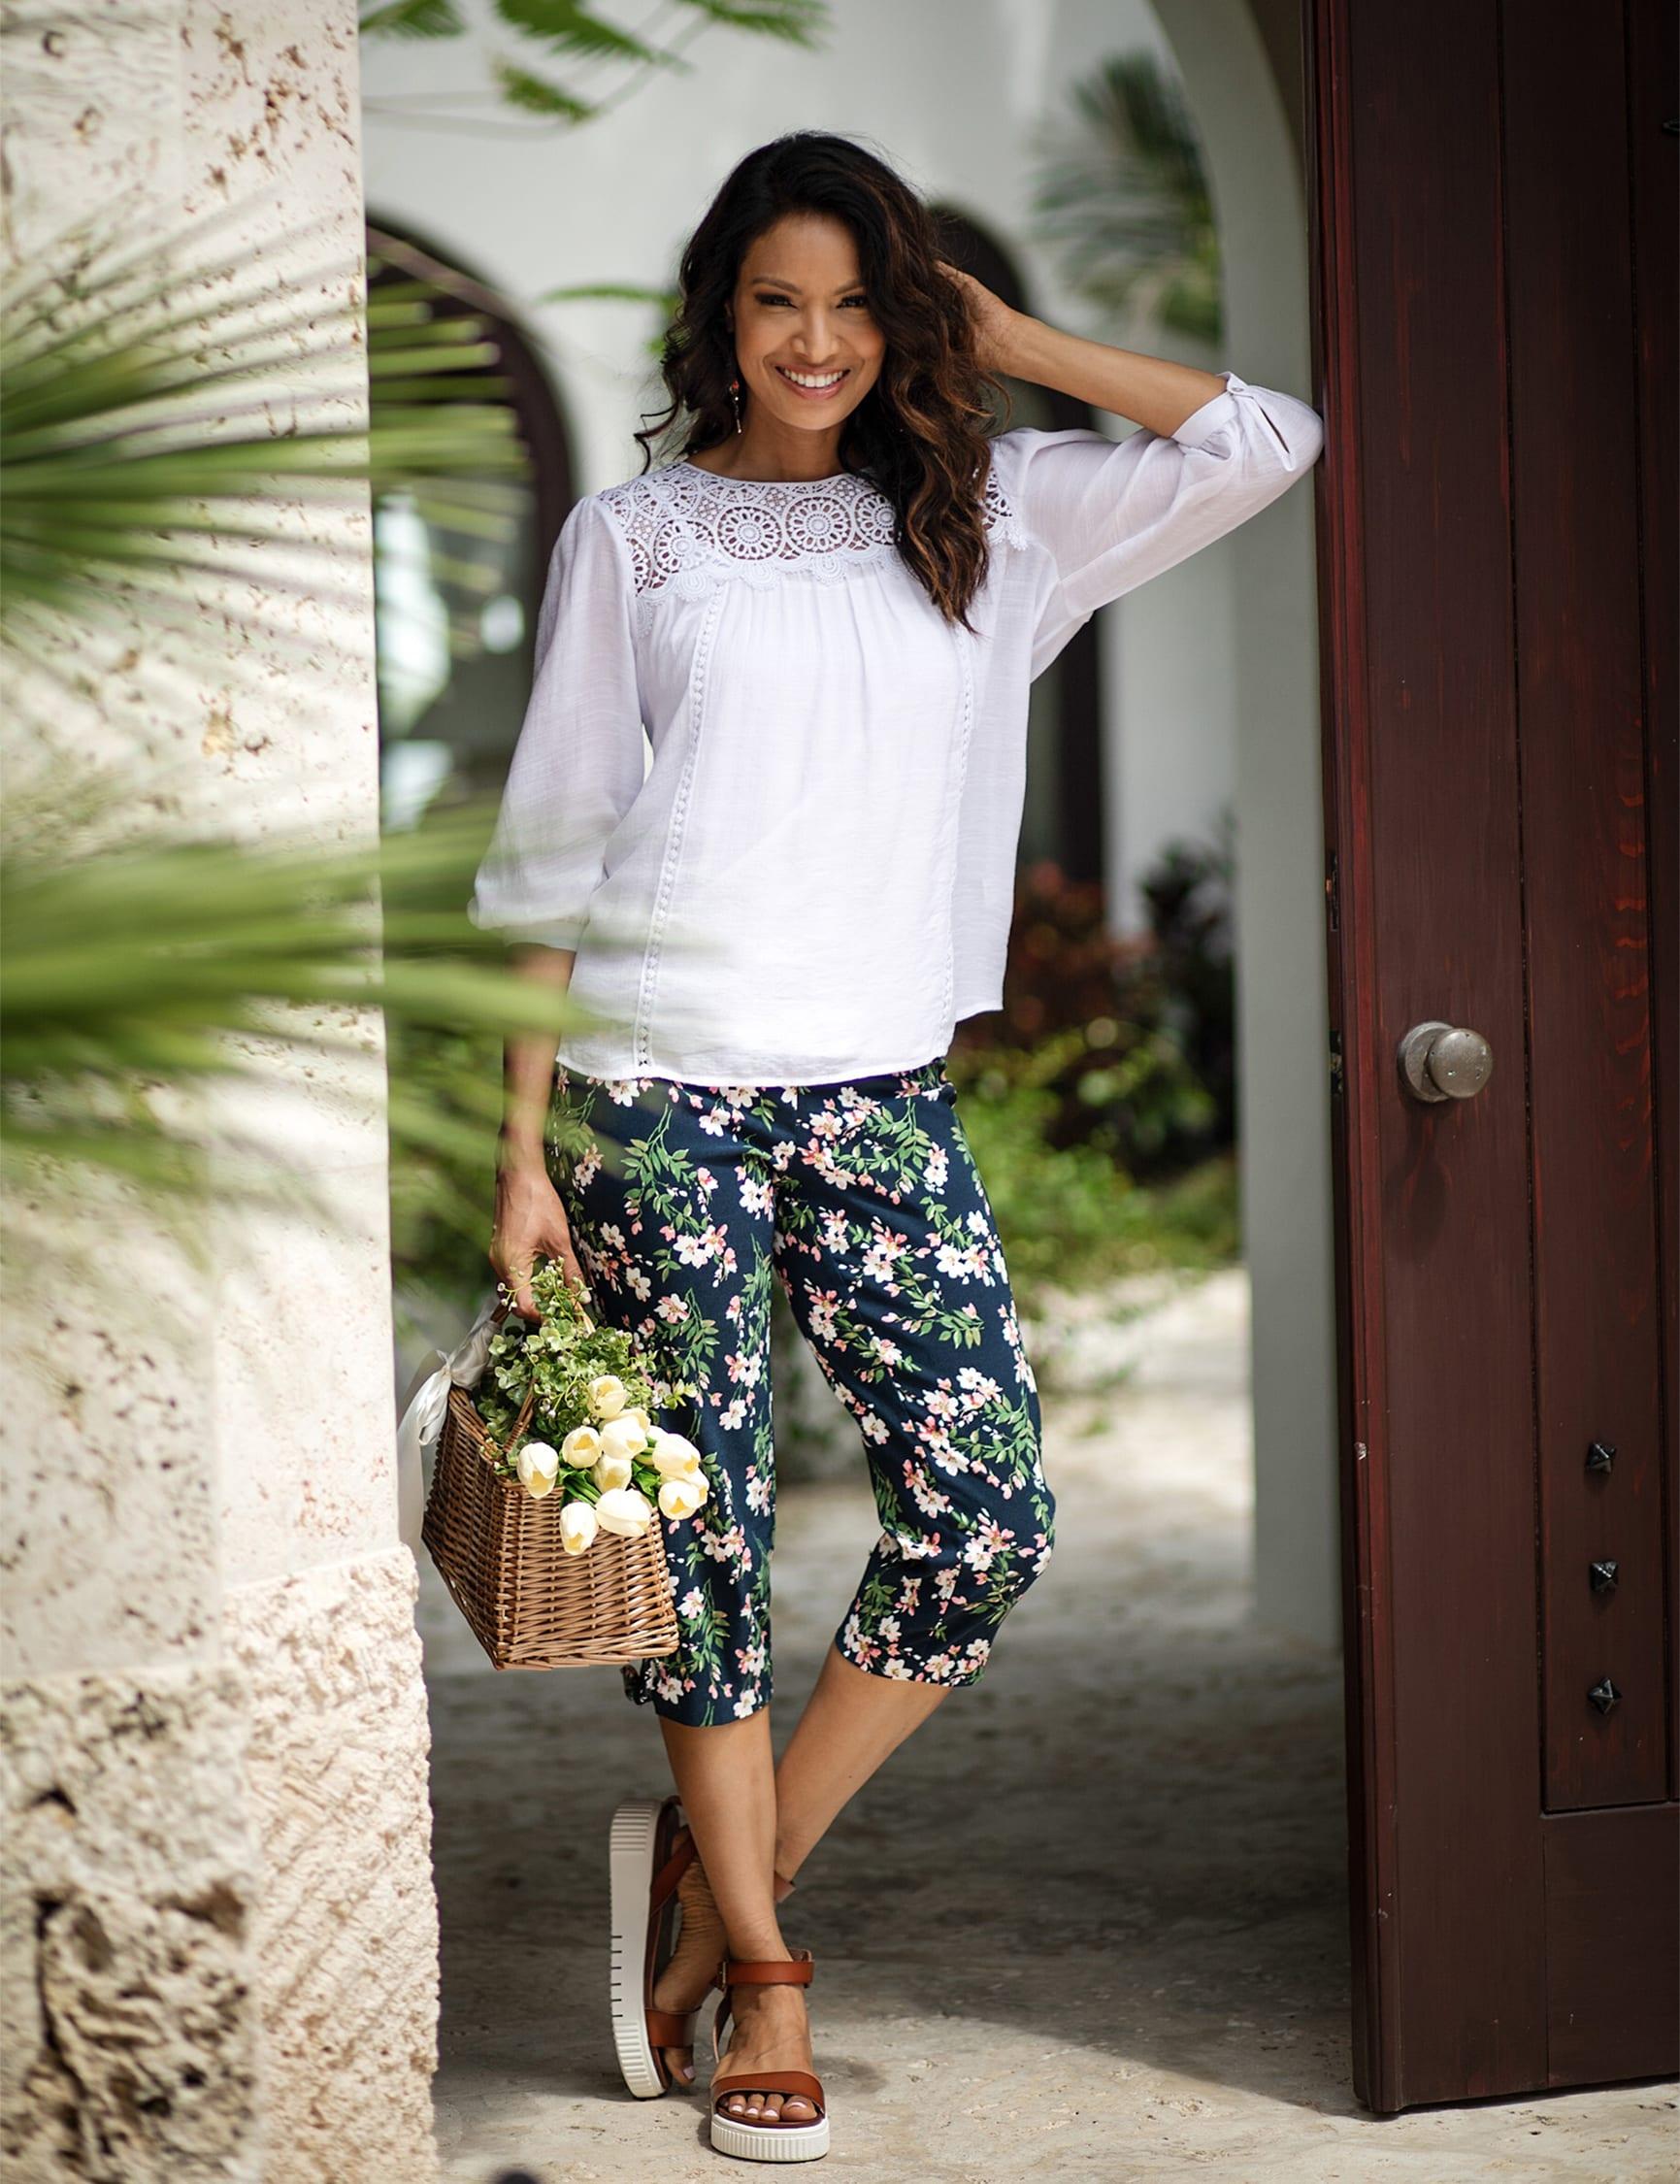 Crochet Textured Blouse - White - Front